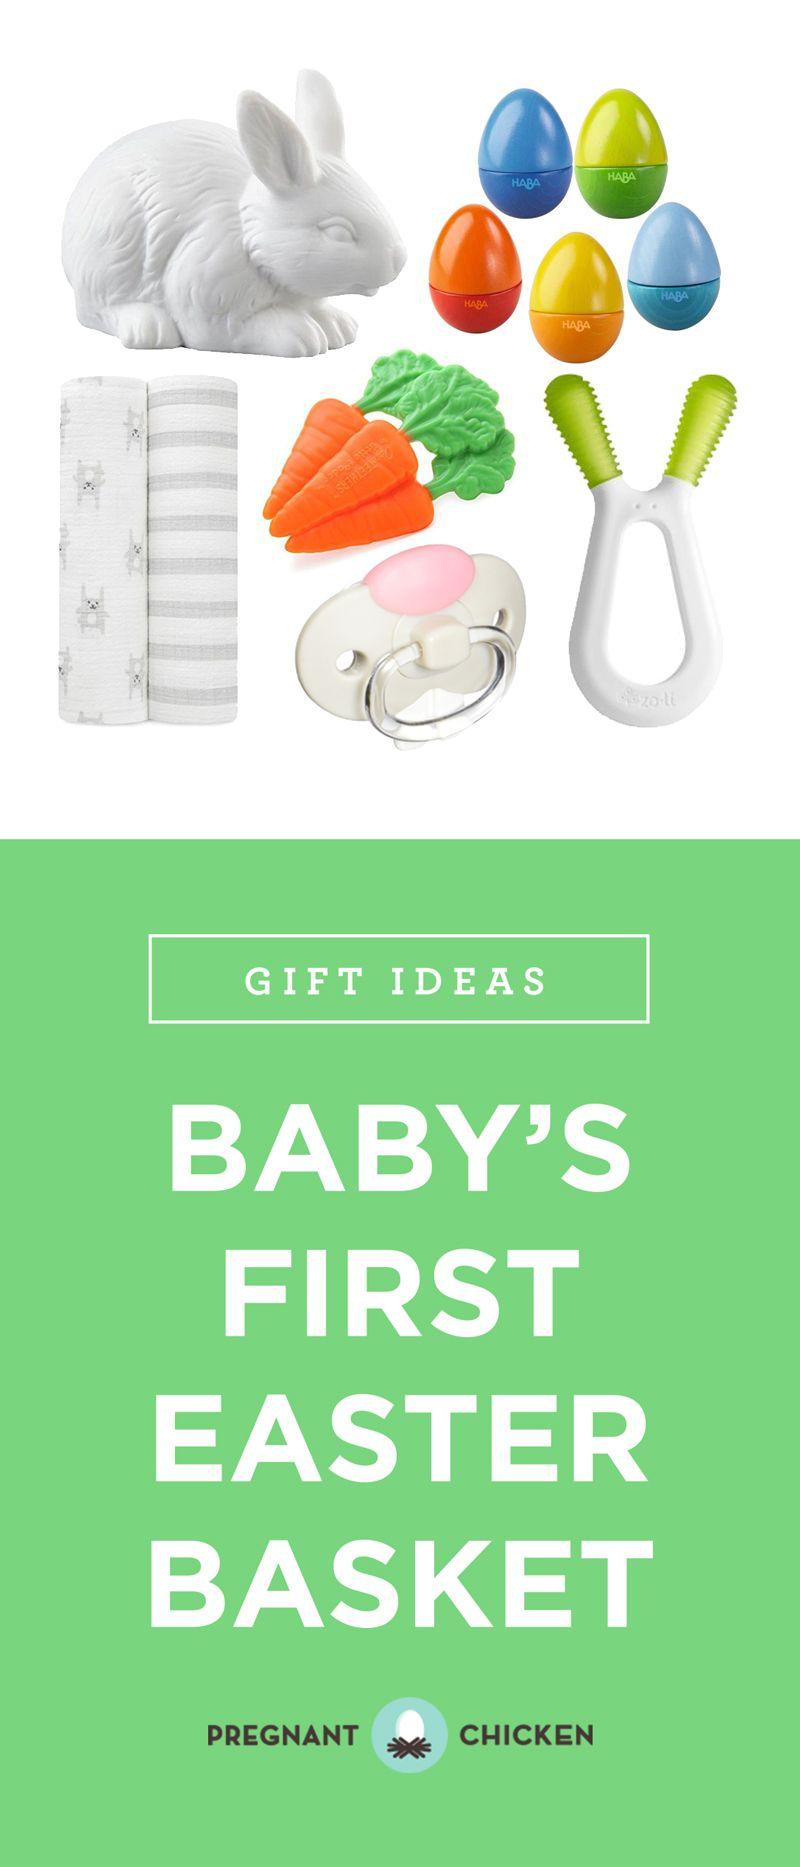 30 Best Easter Basket Ideas For A Baby Pregnant Chicken Baby S First Easter Basket Baby Easter Basket Girls Easter Basket